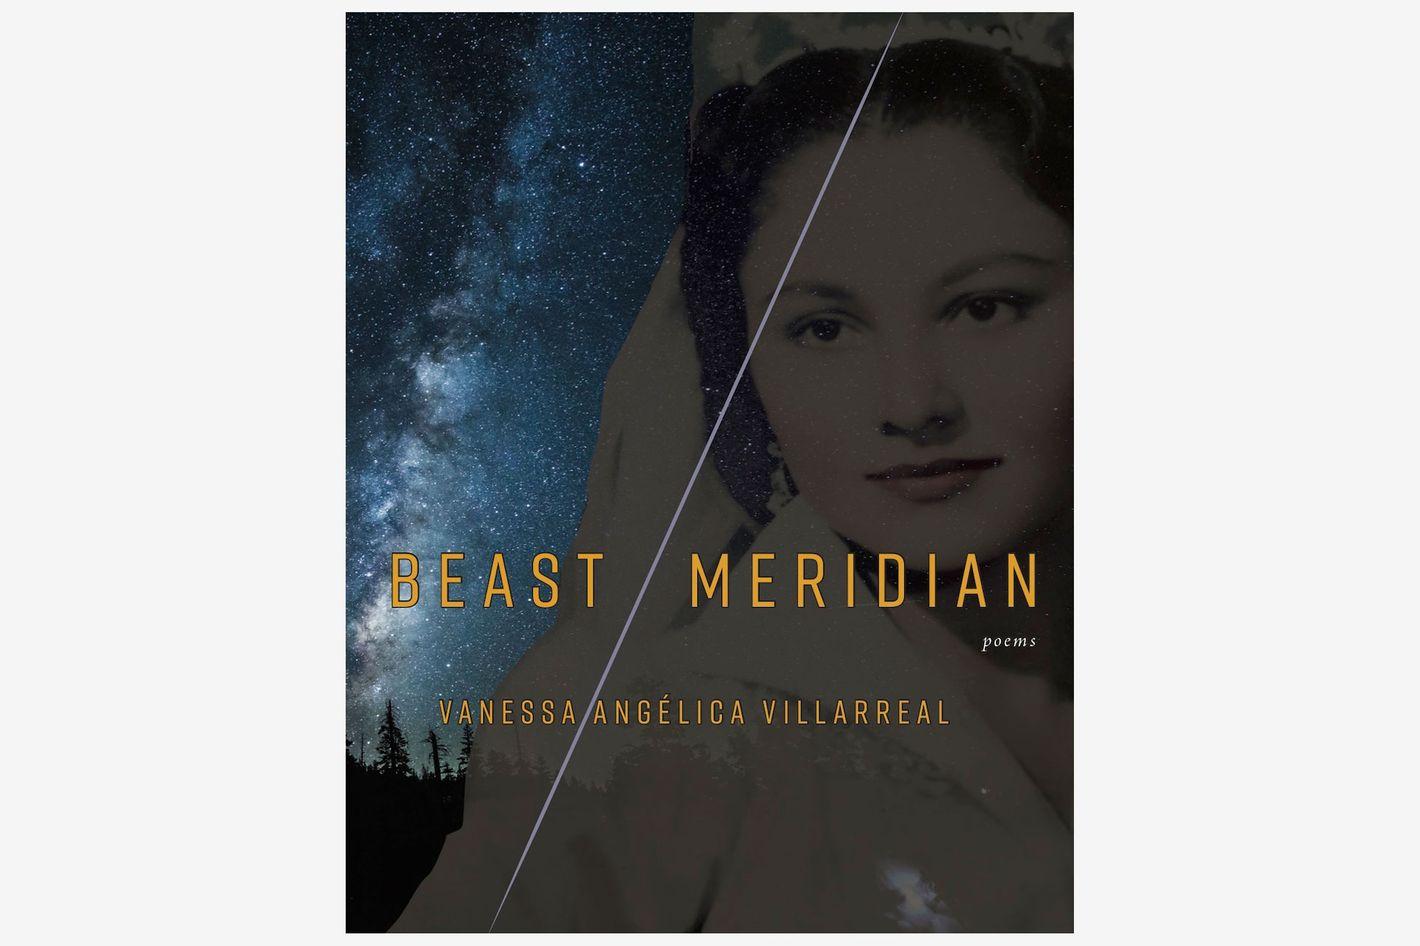 Beast Meridian byVanessa Angelica